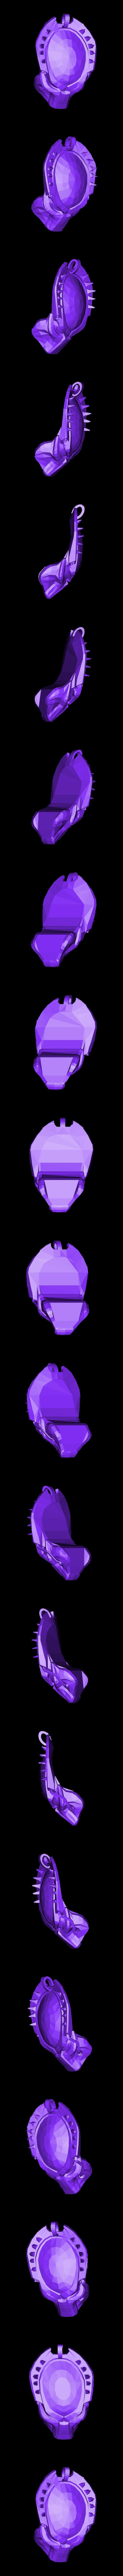 Predator Victor máscara.stl Download STL file Predator Pendant • Object to 3D print, Kraken1983